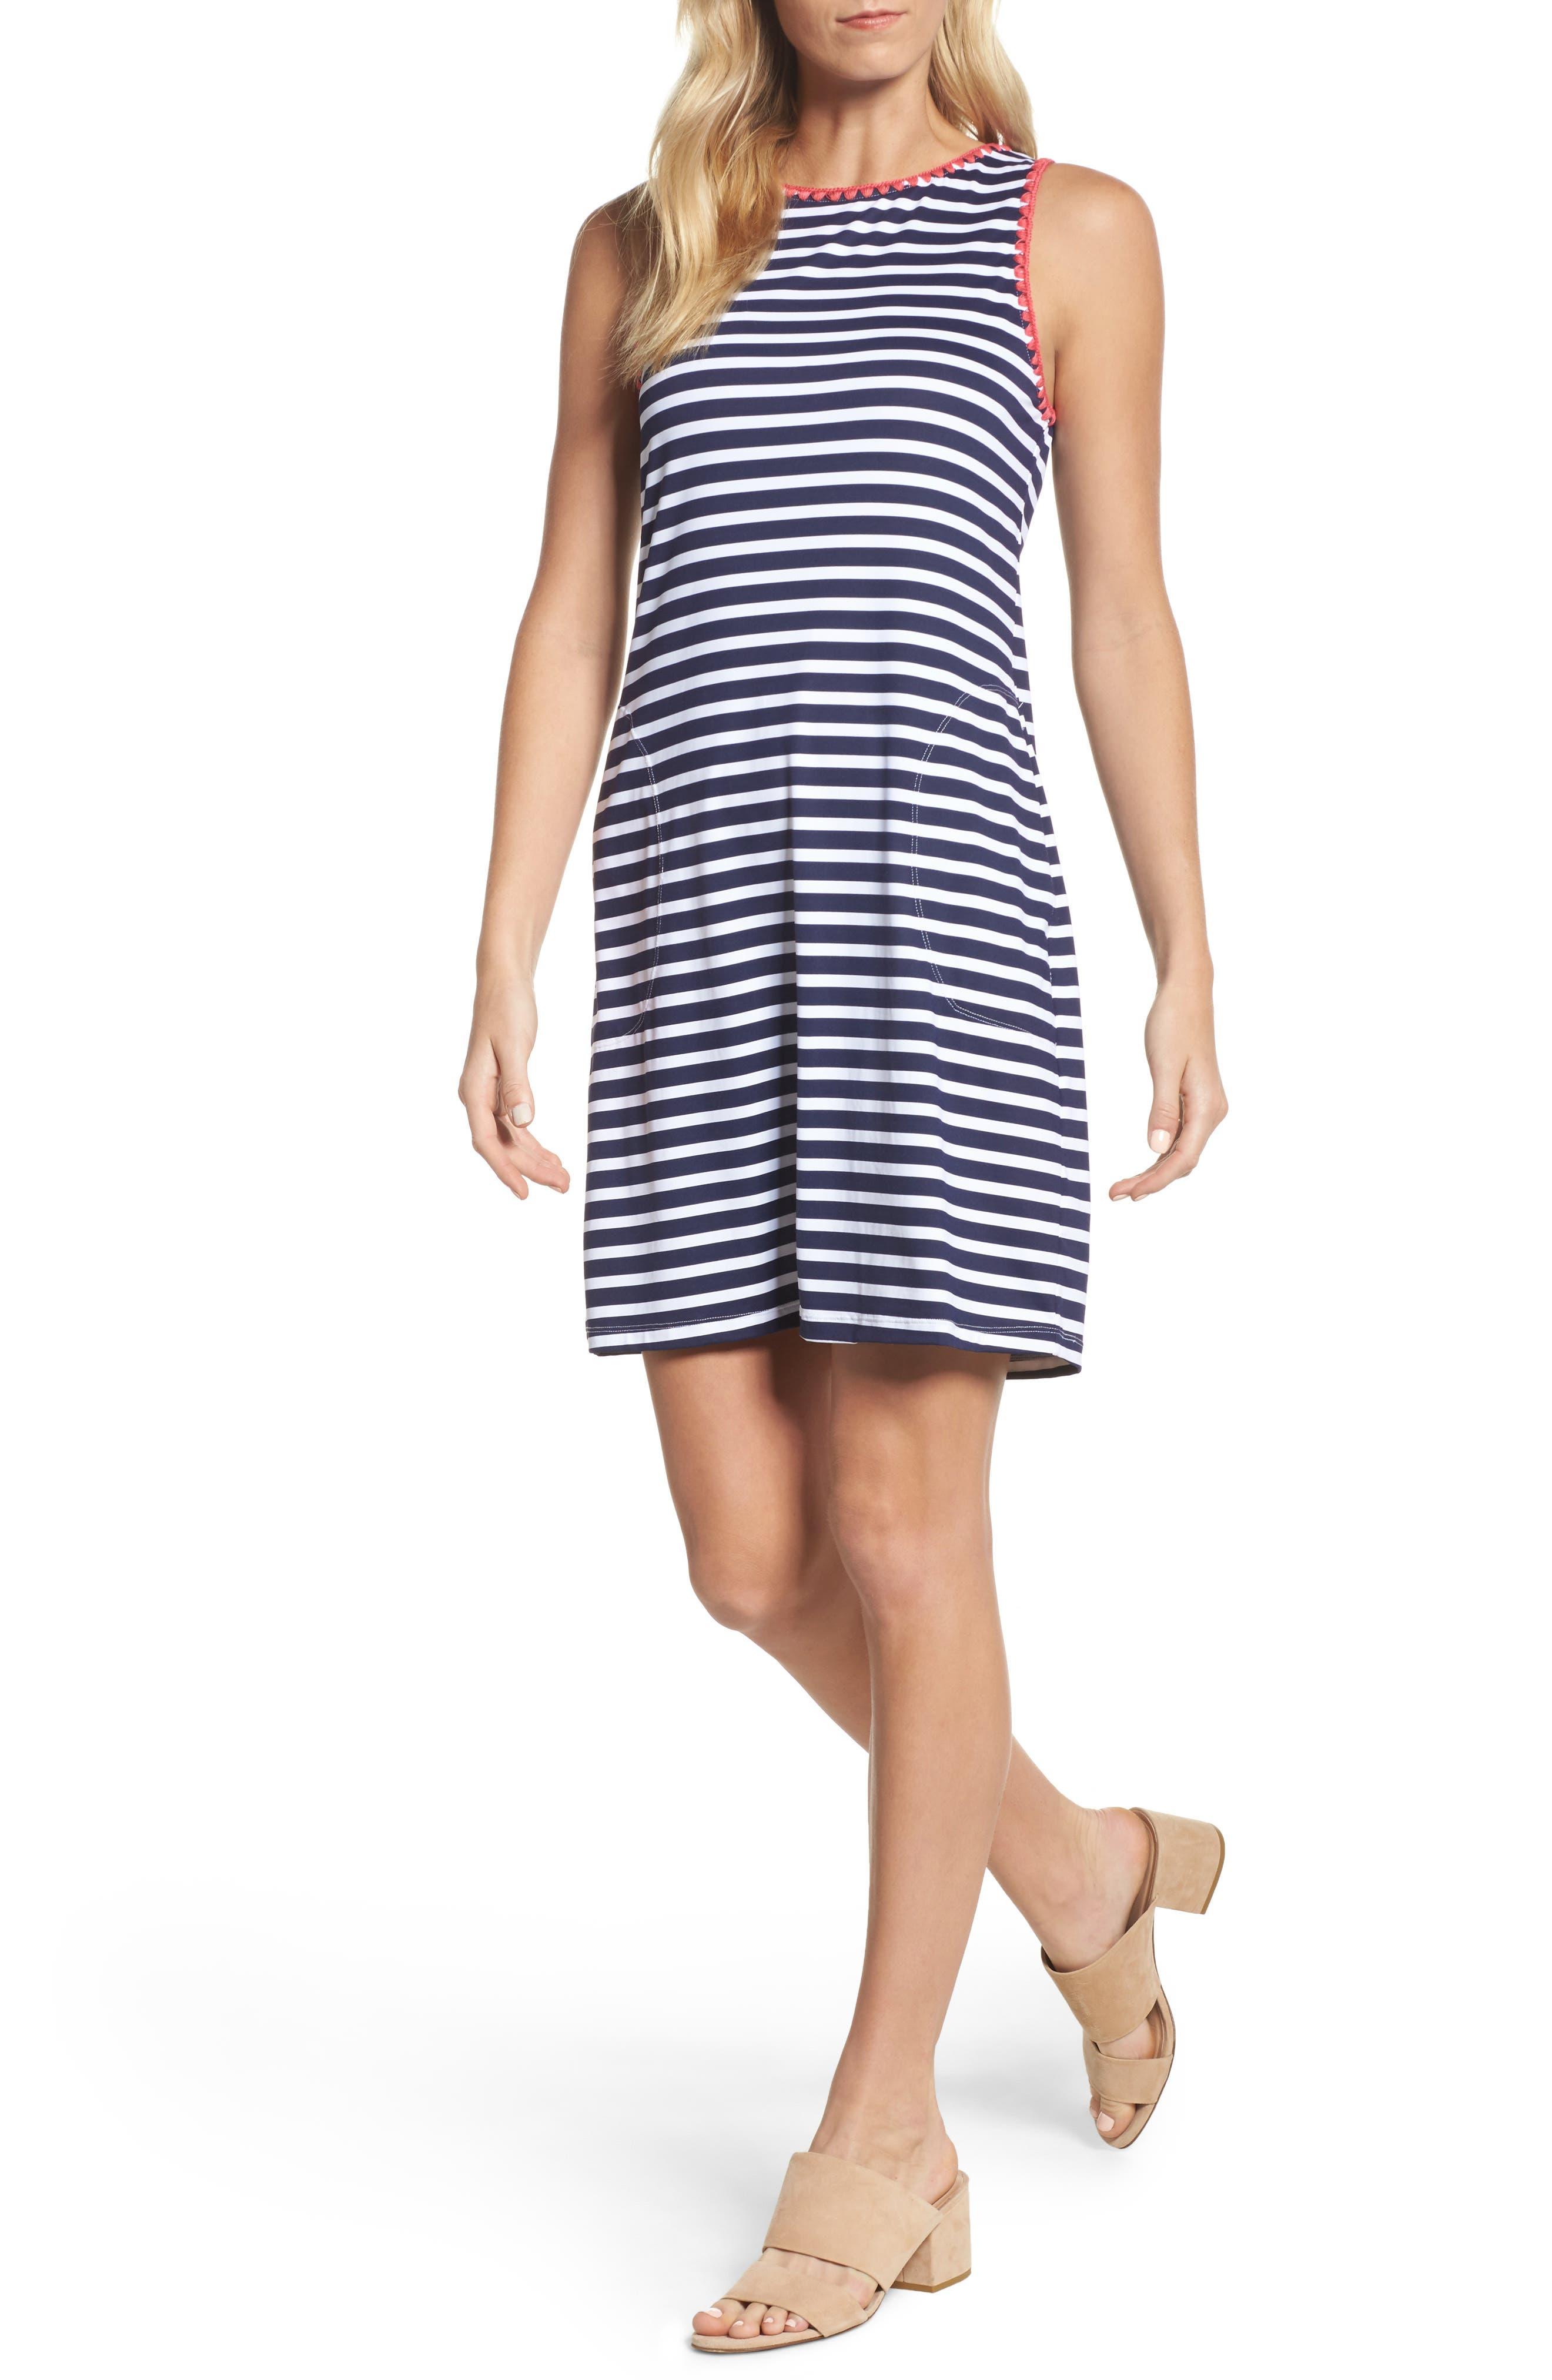 Breton Stripe Cover-Up Dress,                             Main thumbnail 1, color,                             MARE NAVY/ WHITE